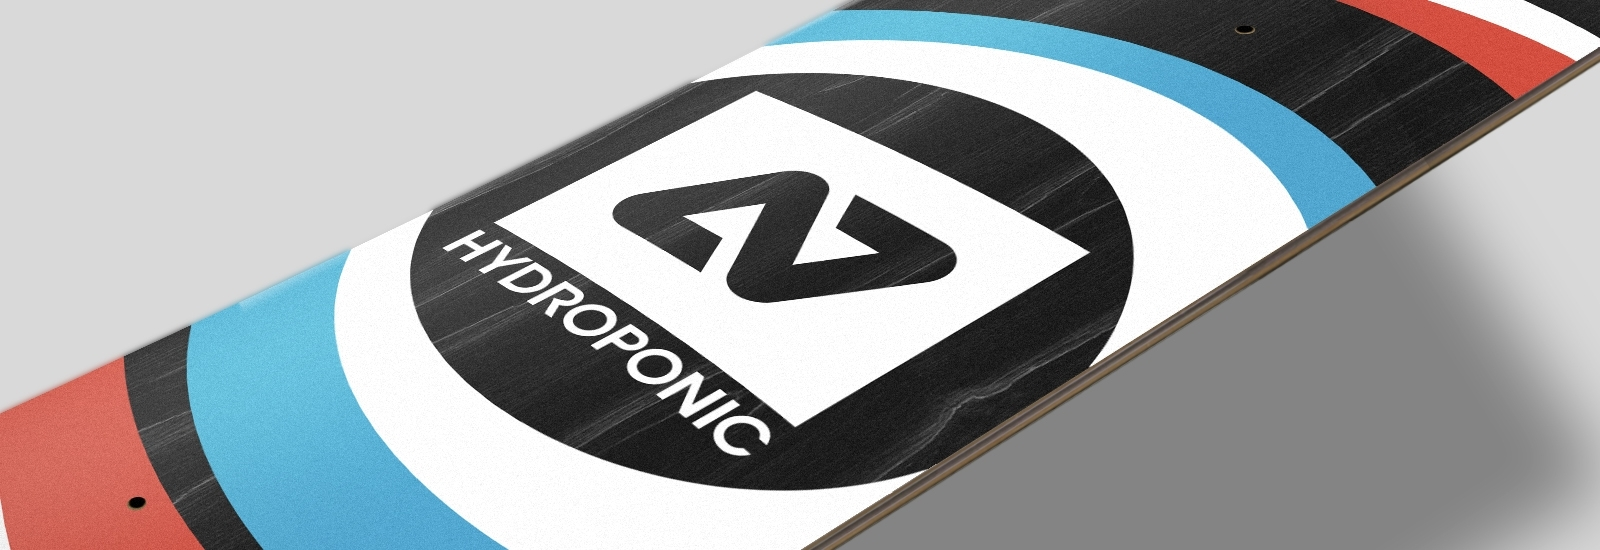 Tablas Skate - Hydroponic